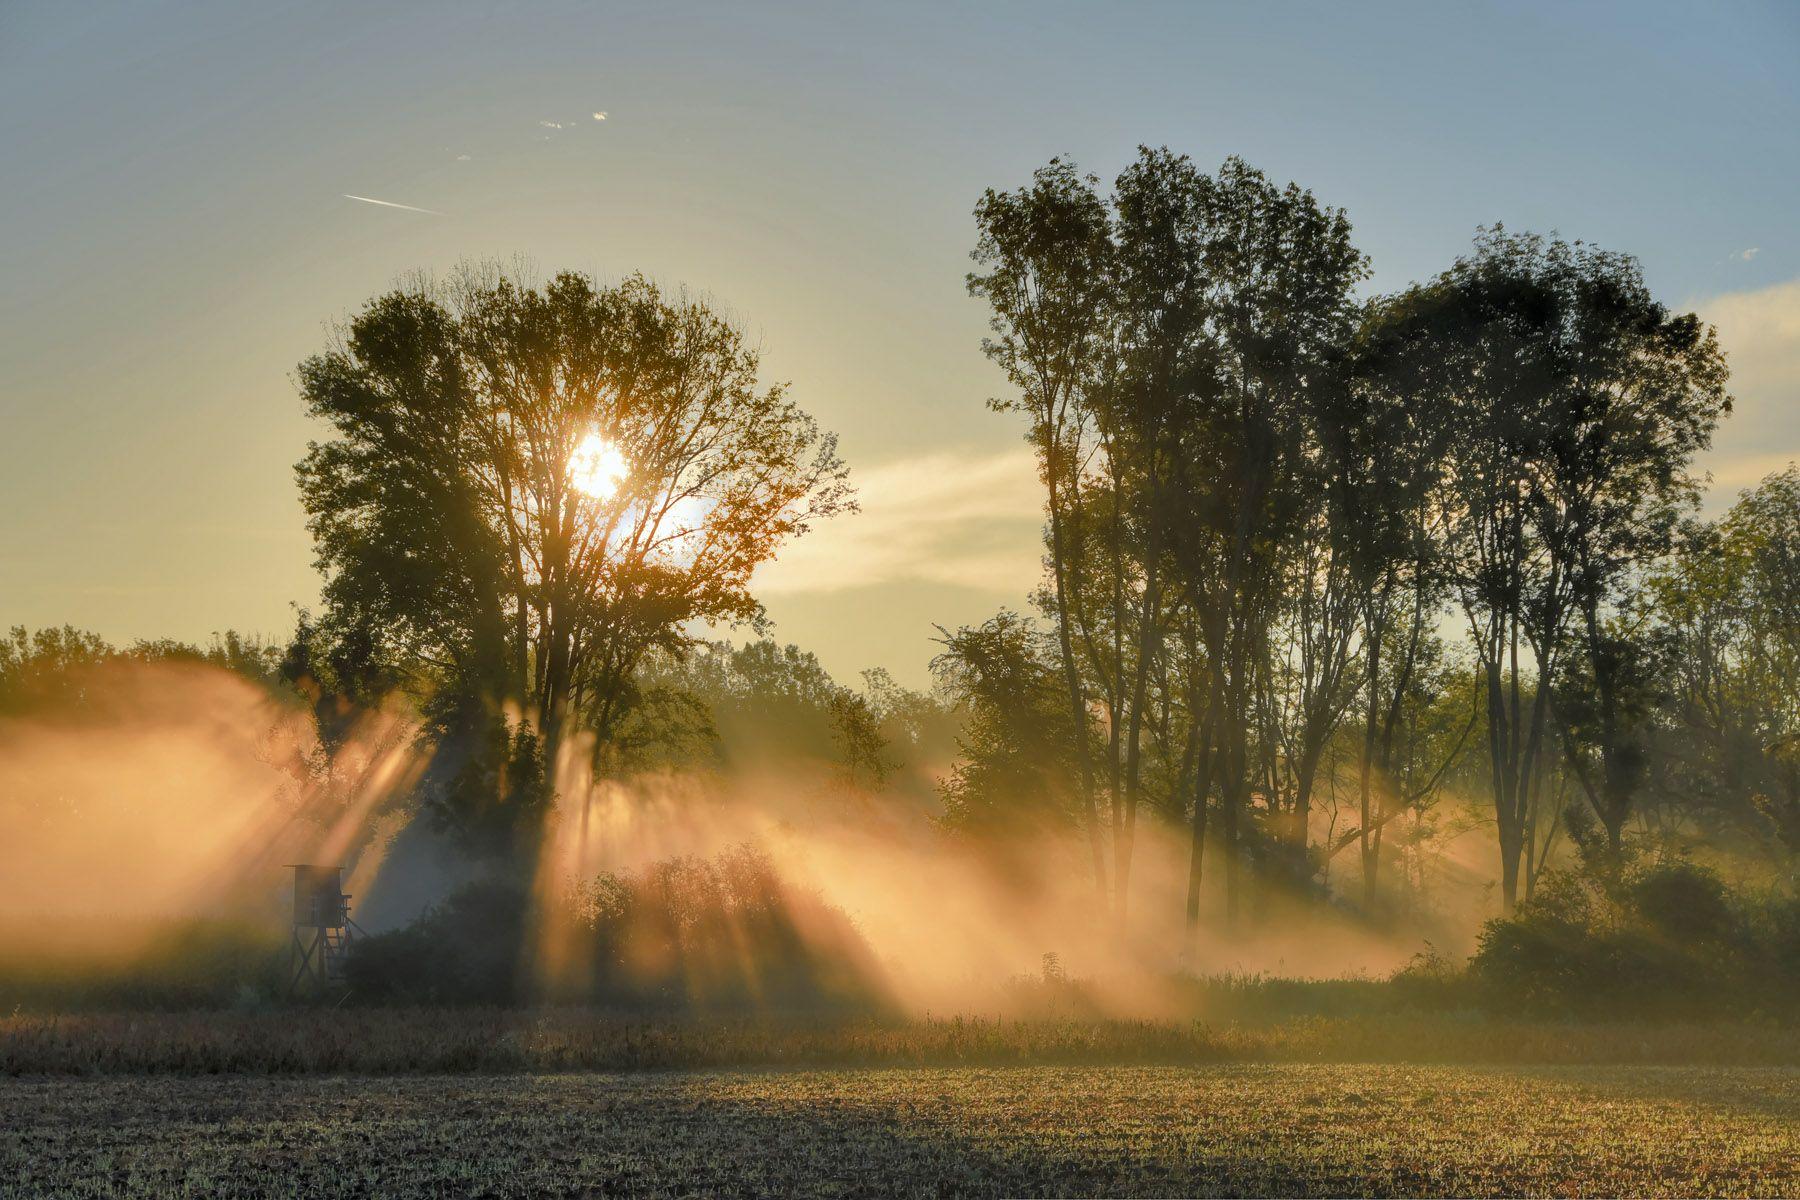 ъъ утро небо лес свет туман